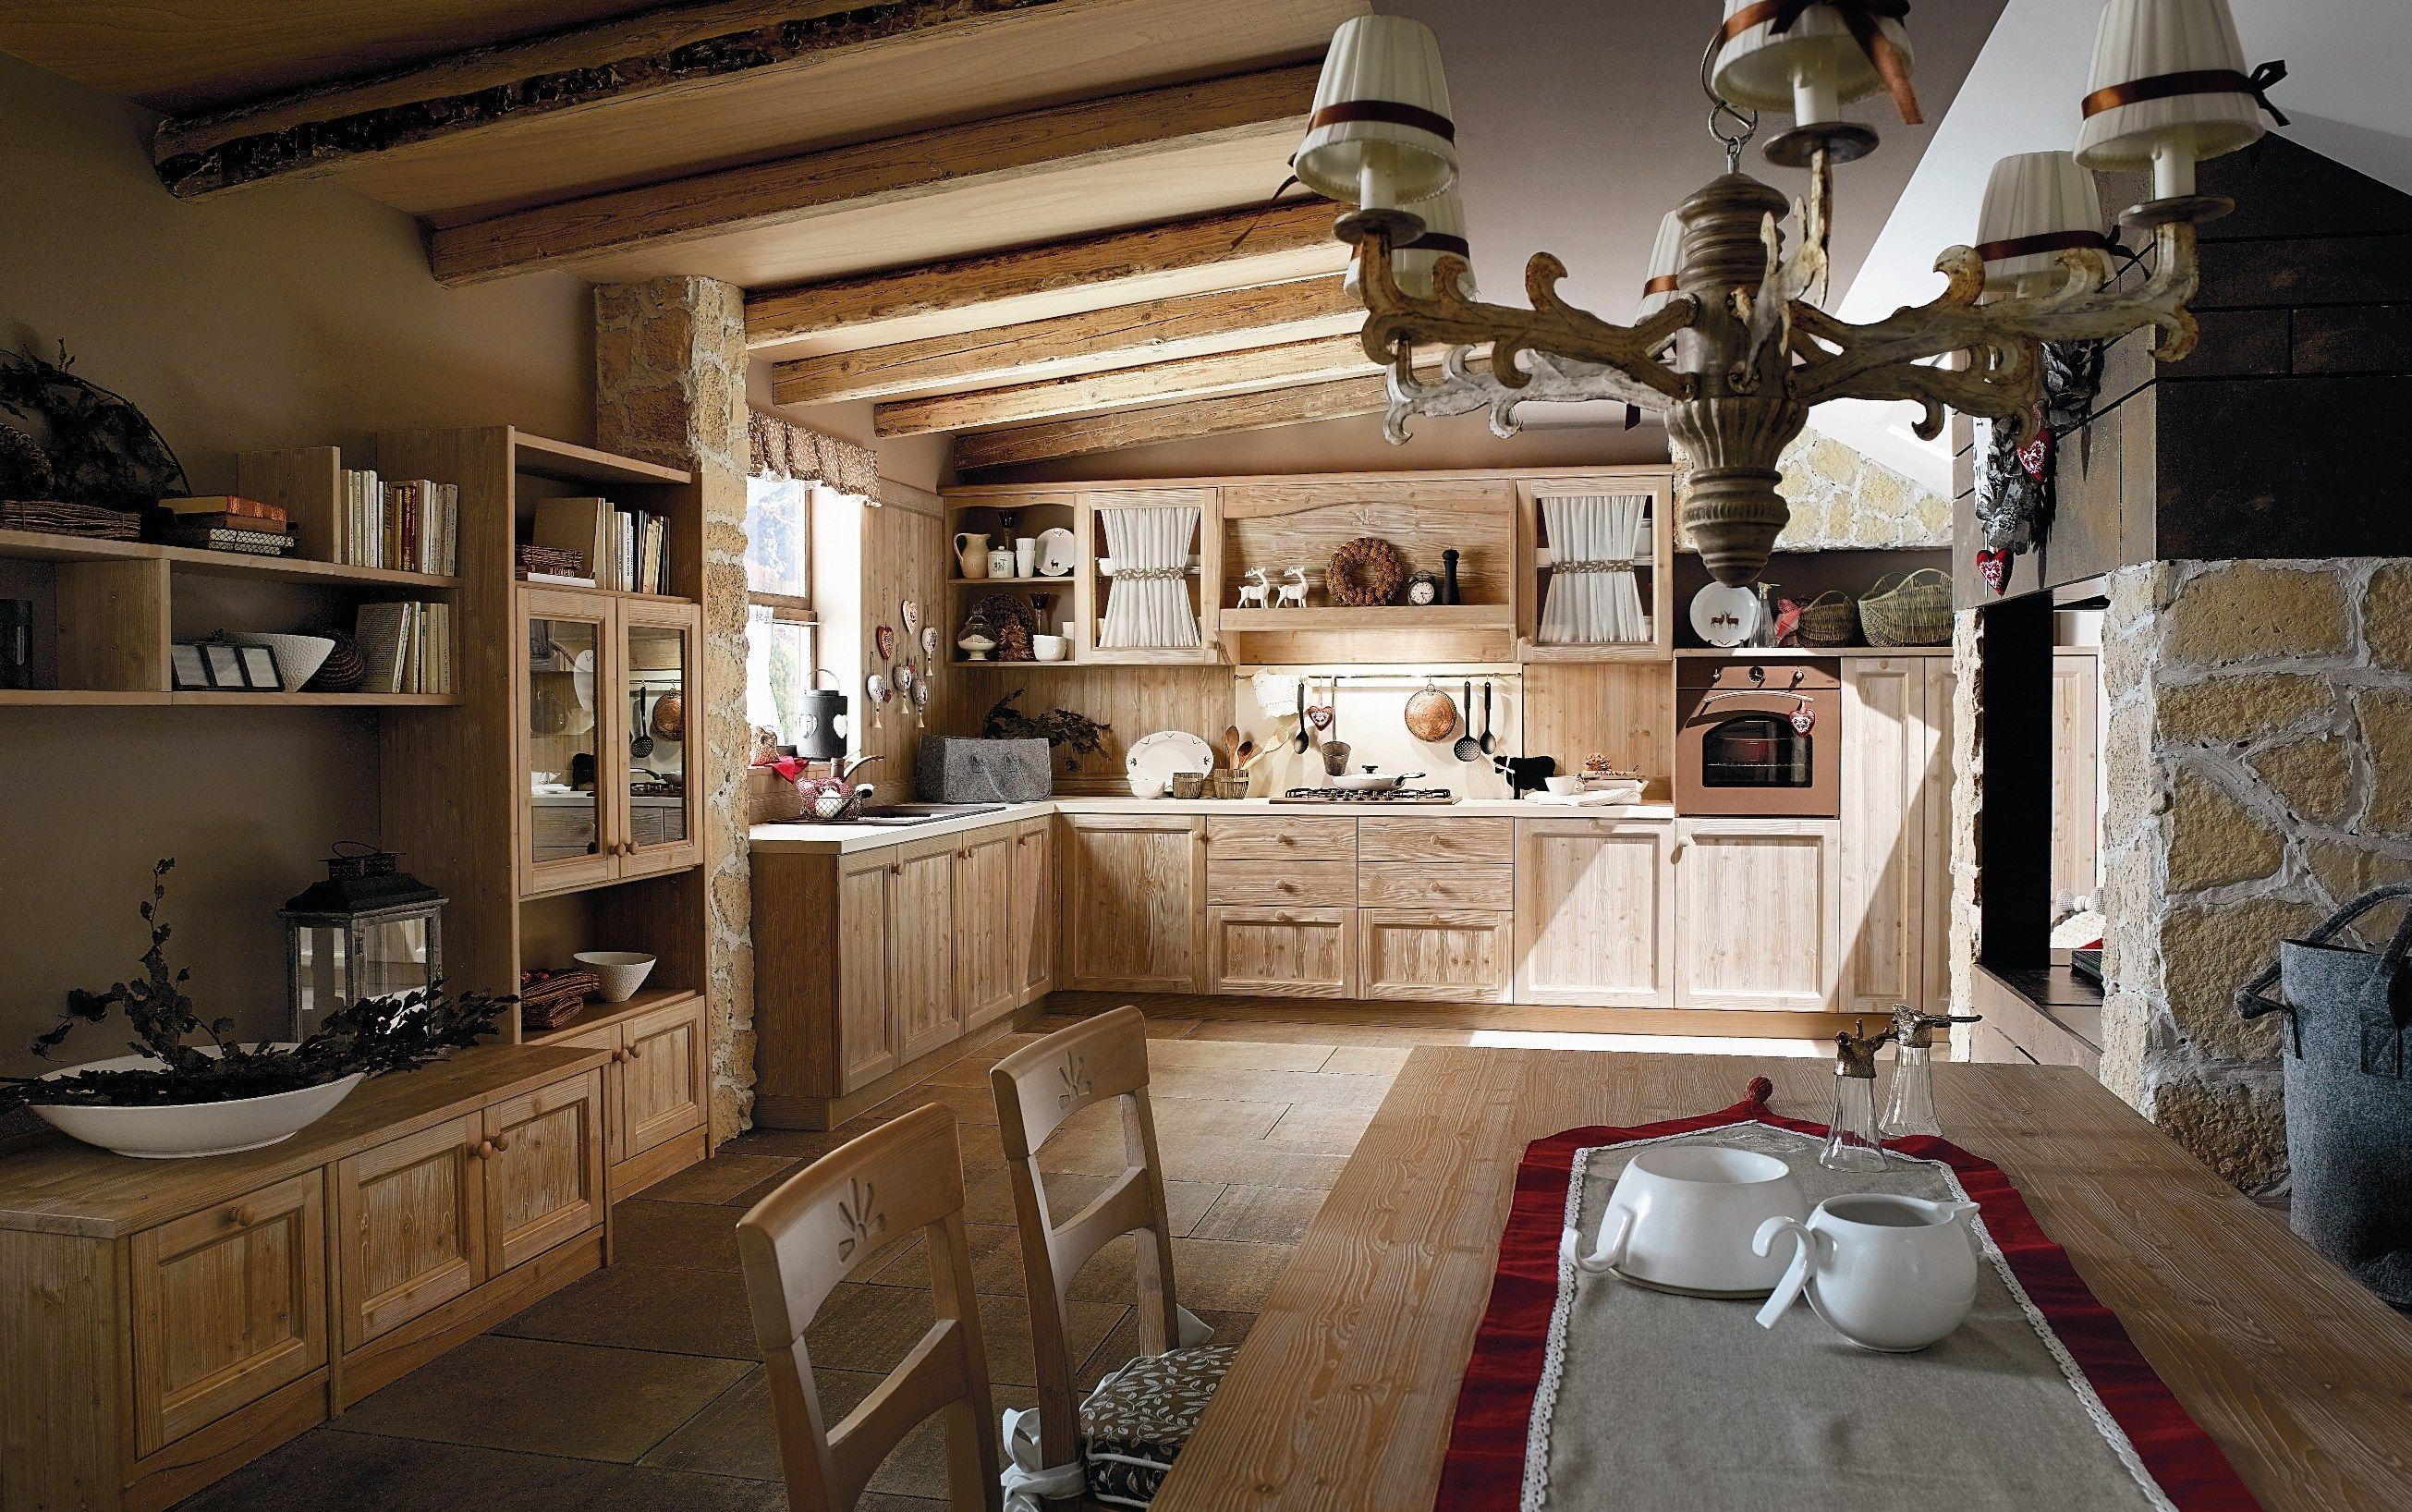 Sale da pranzo classiche usate - Cucine in stile rustico ...